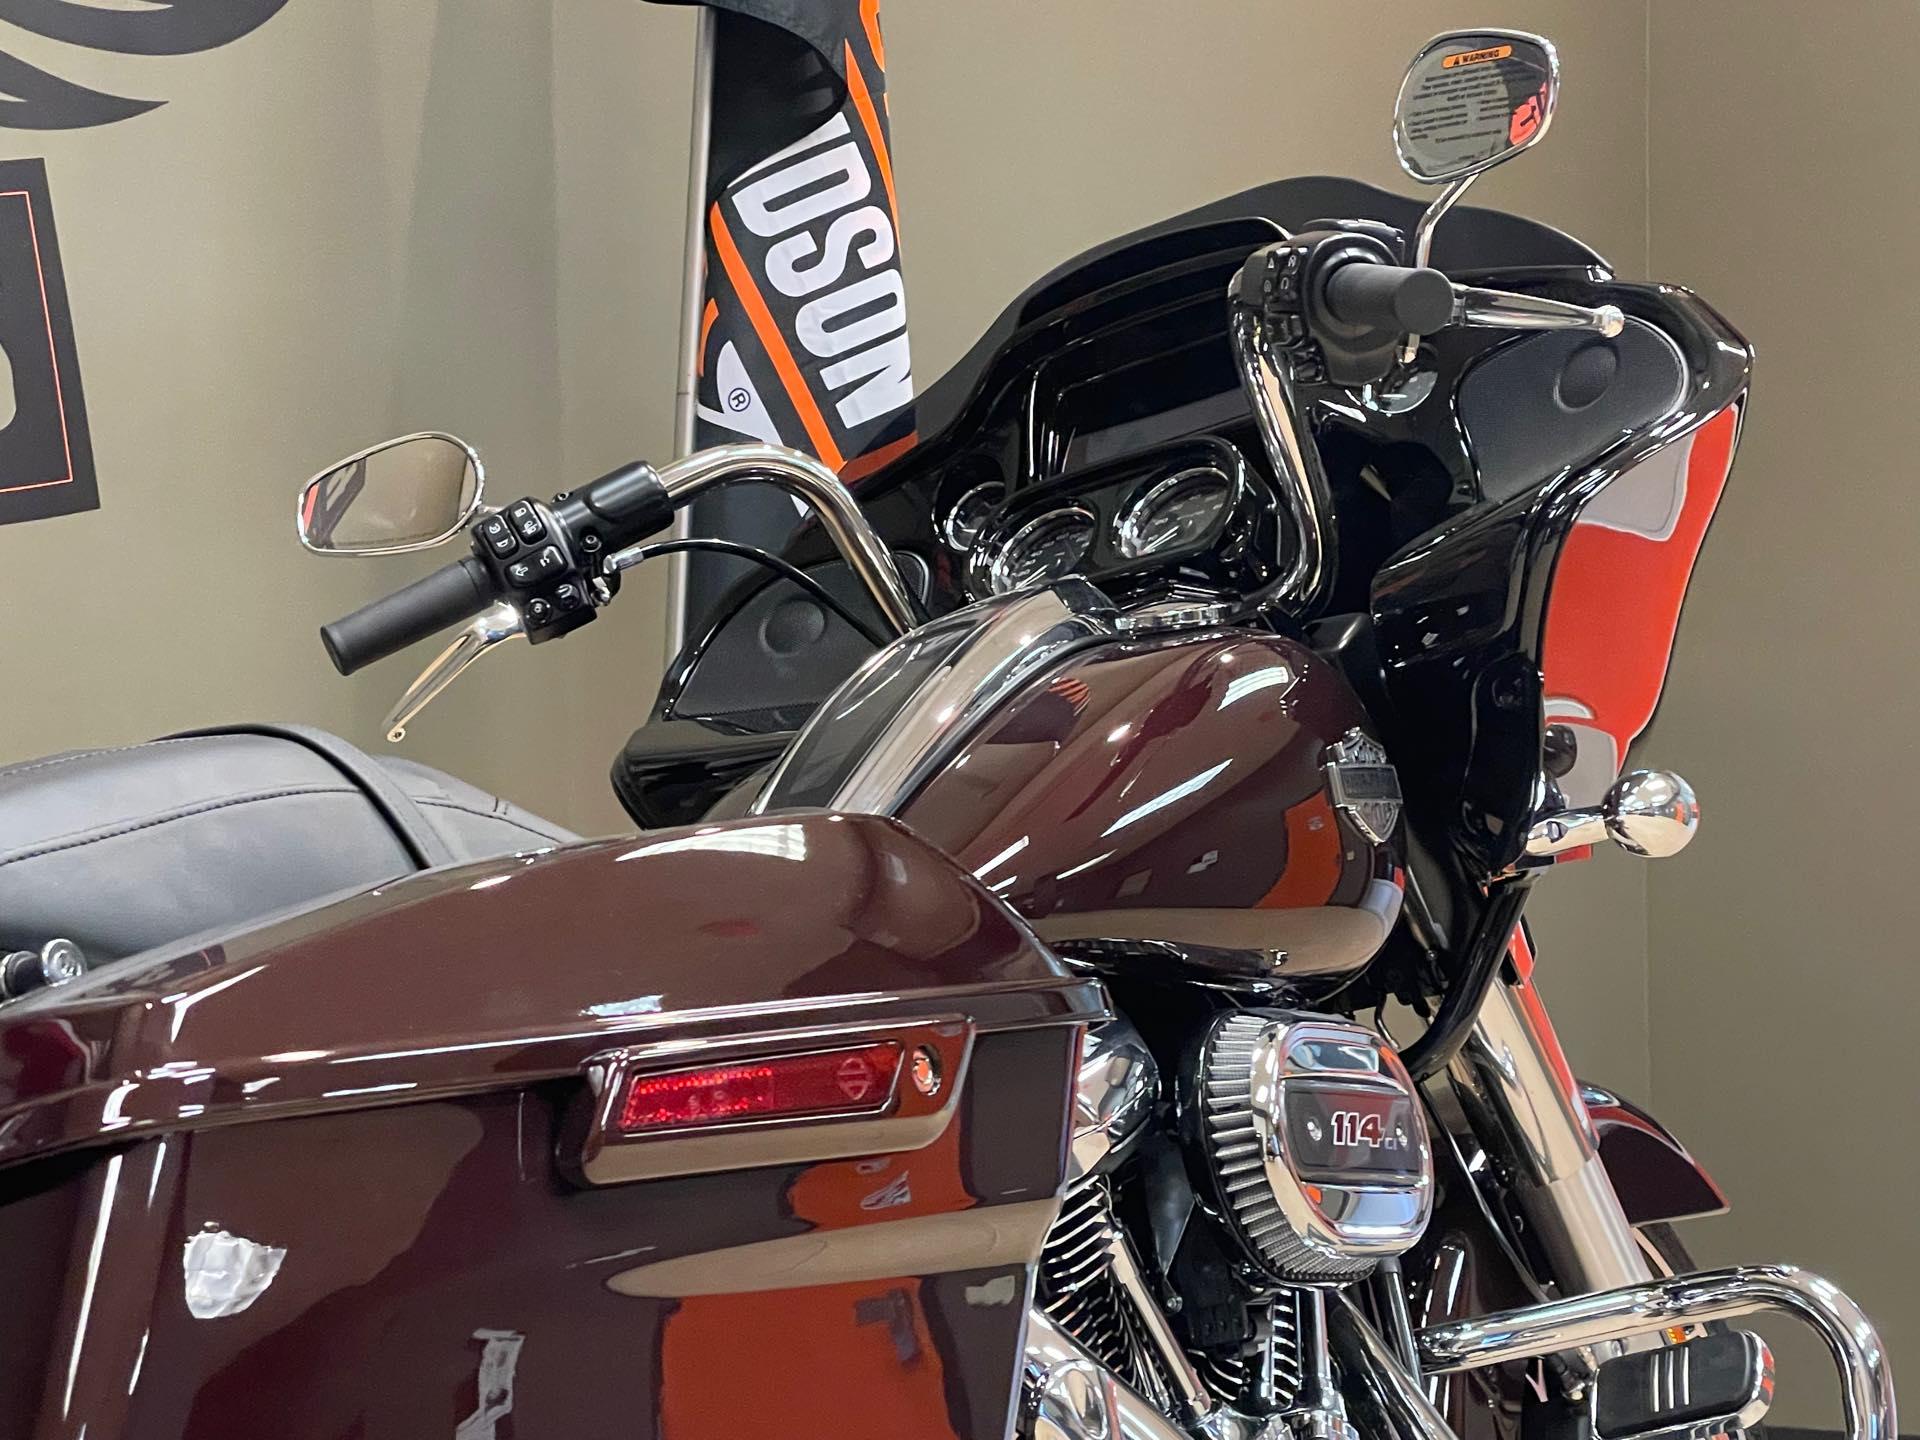 2021 Harley-Davidson Grand American Touring Road Glide Special at Loess Hills Harley-Davidson